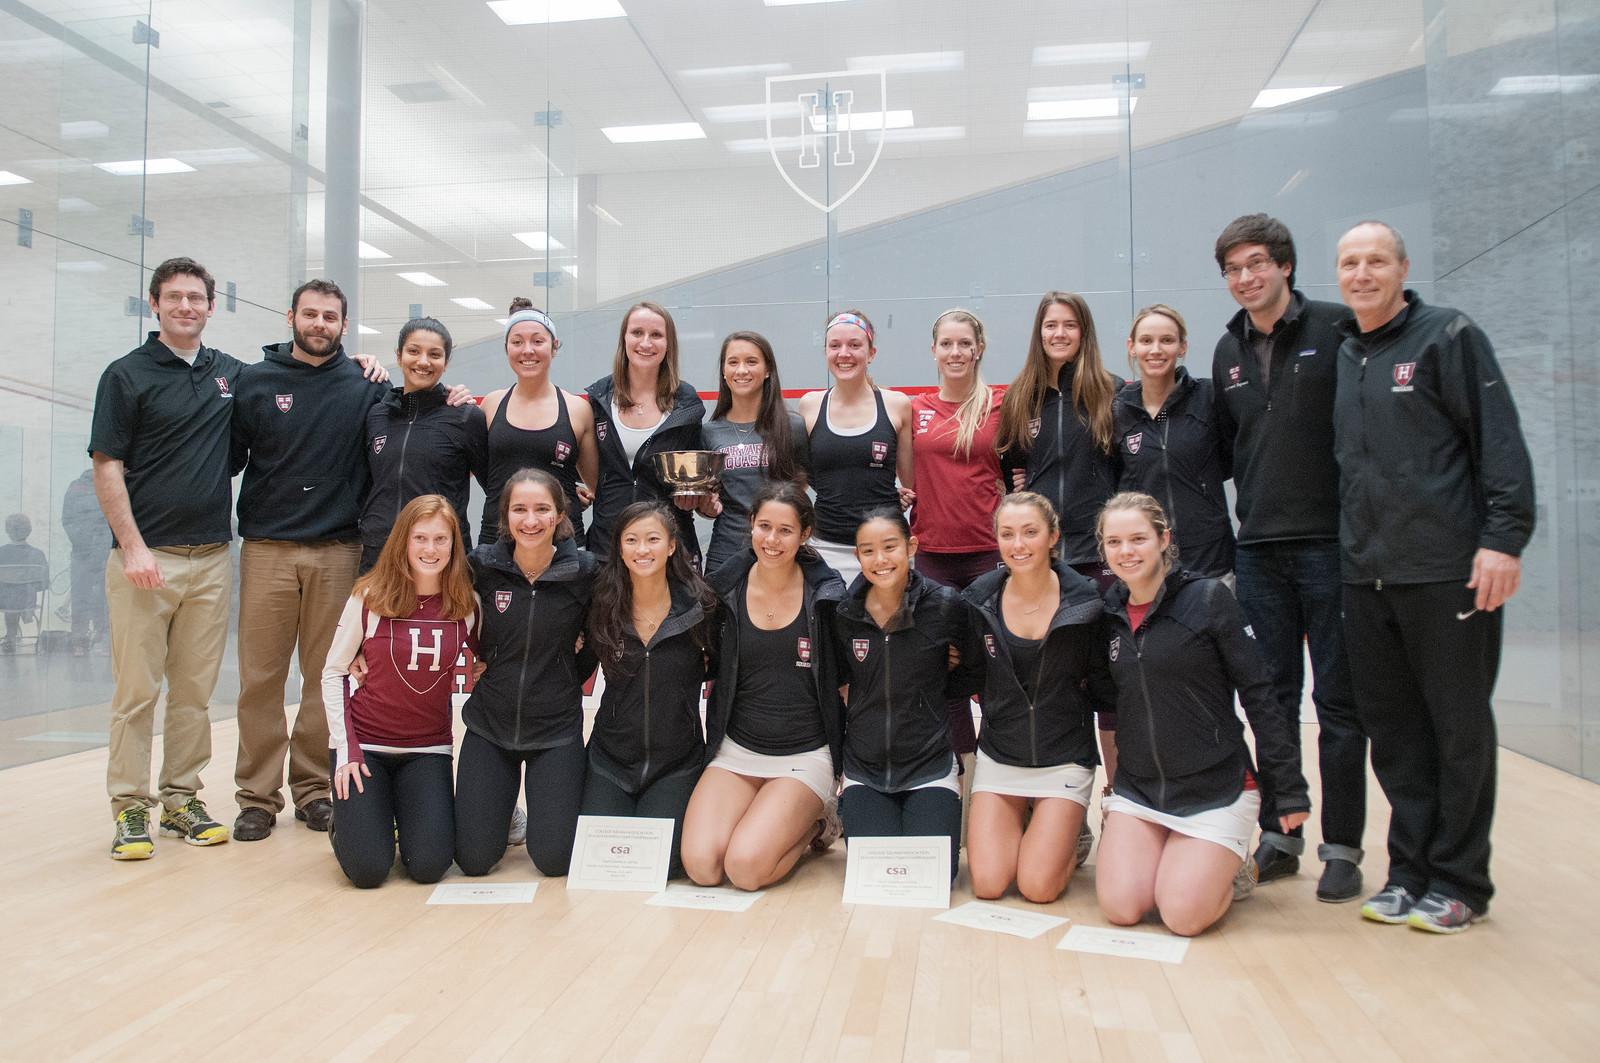 Life on the Tour: Amanda Sobhy '15, Haley Mendez '15, and Sabrina Sobhy '19 Reflect on Time at Harvard, Pro Squash Careers | Sports | The Harvard Crimson